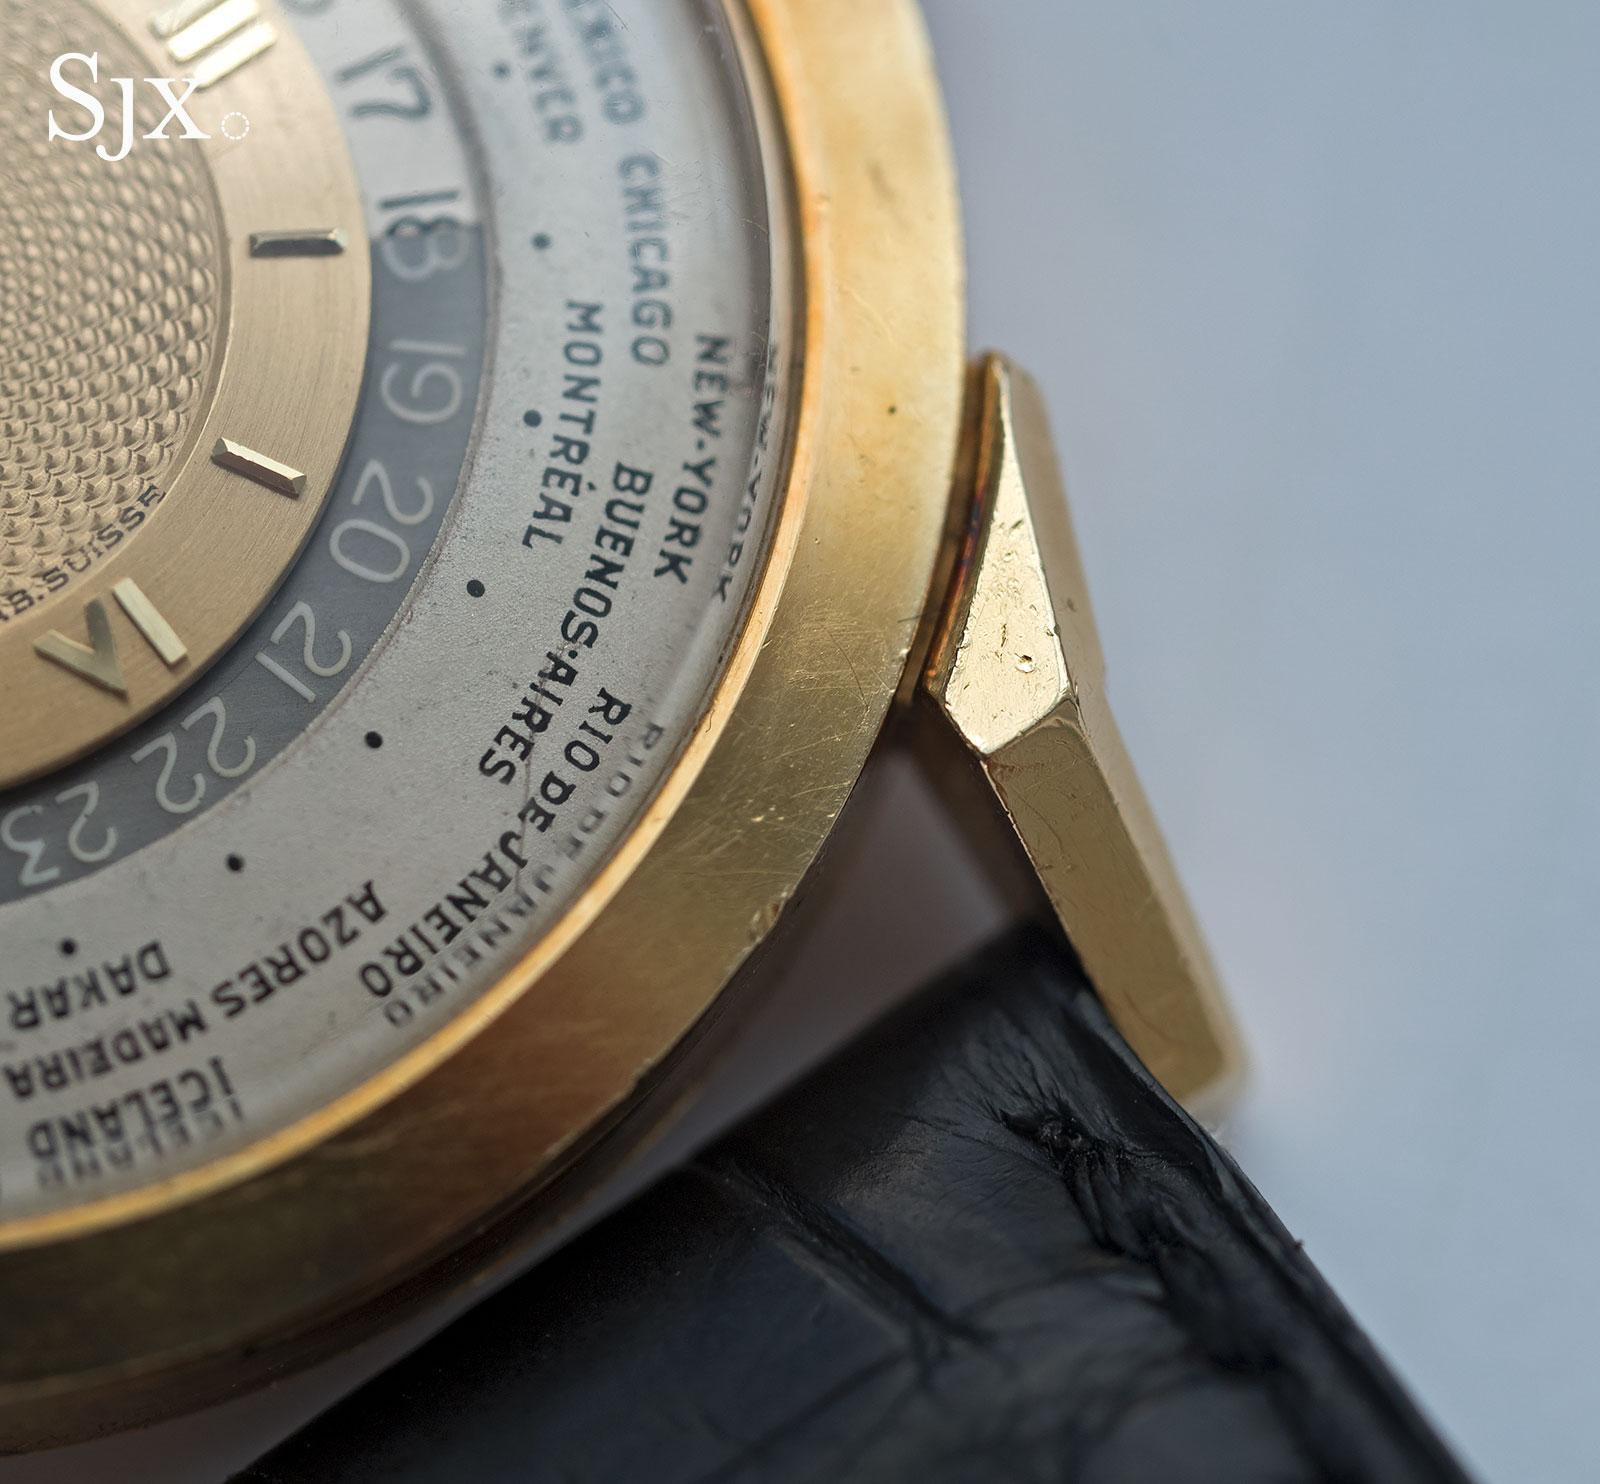 Patek Philippe 2523 gold guilloche 9